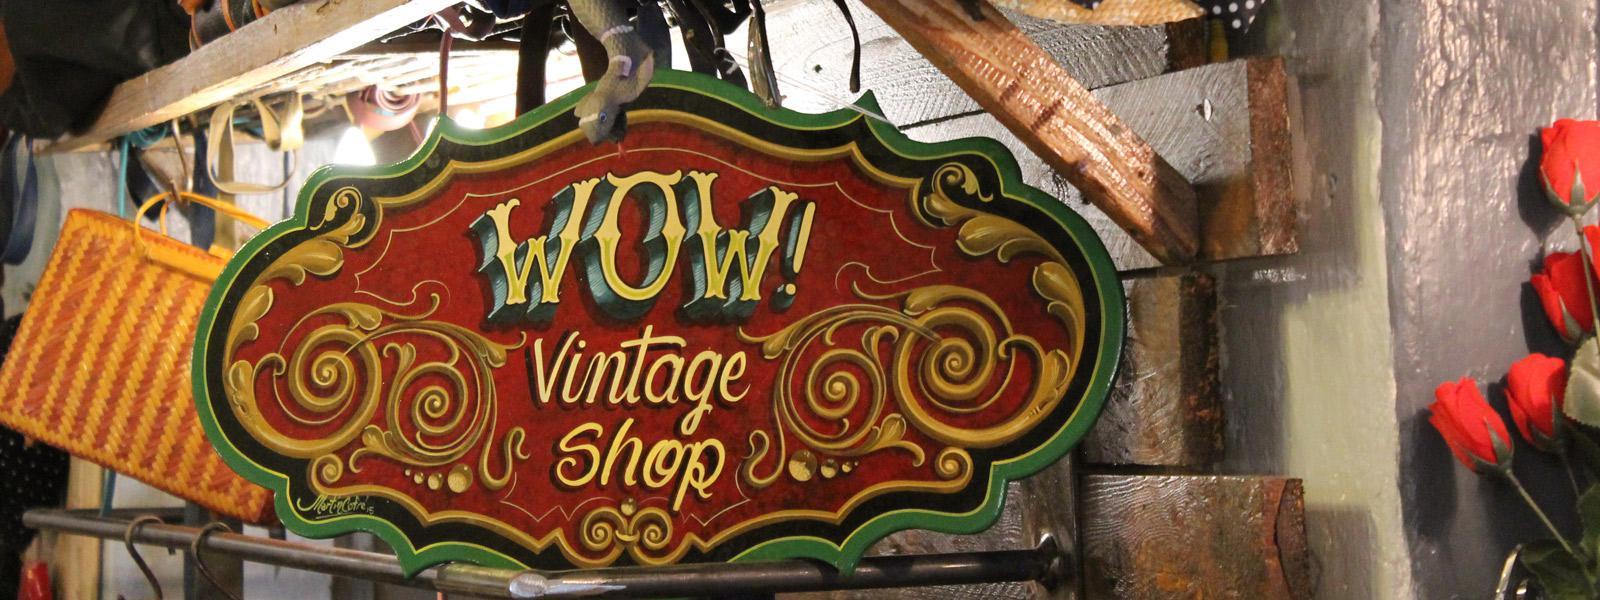 Wow vintage shop abbigliamento vintage Vetrinando Arezzo